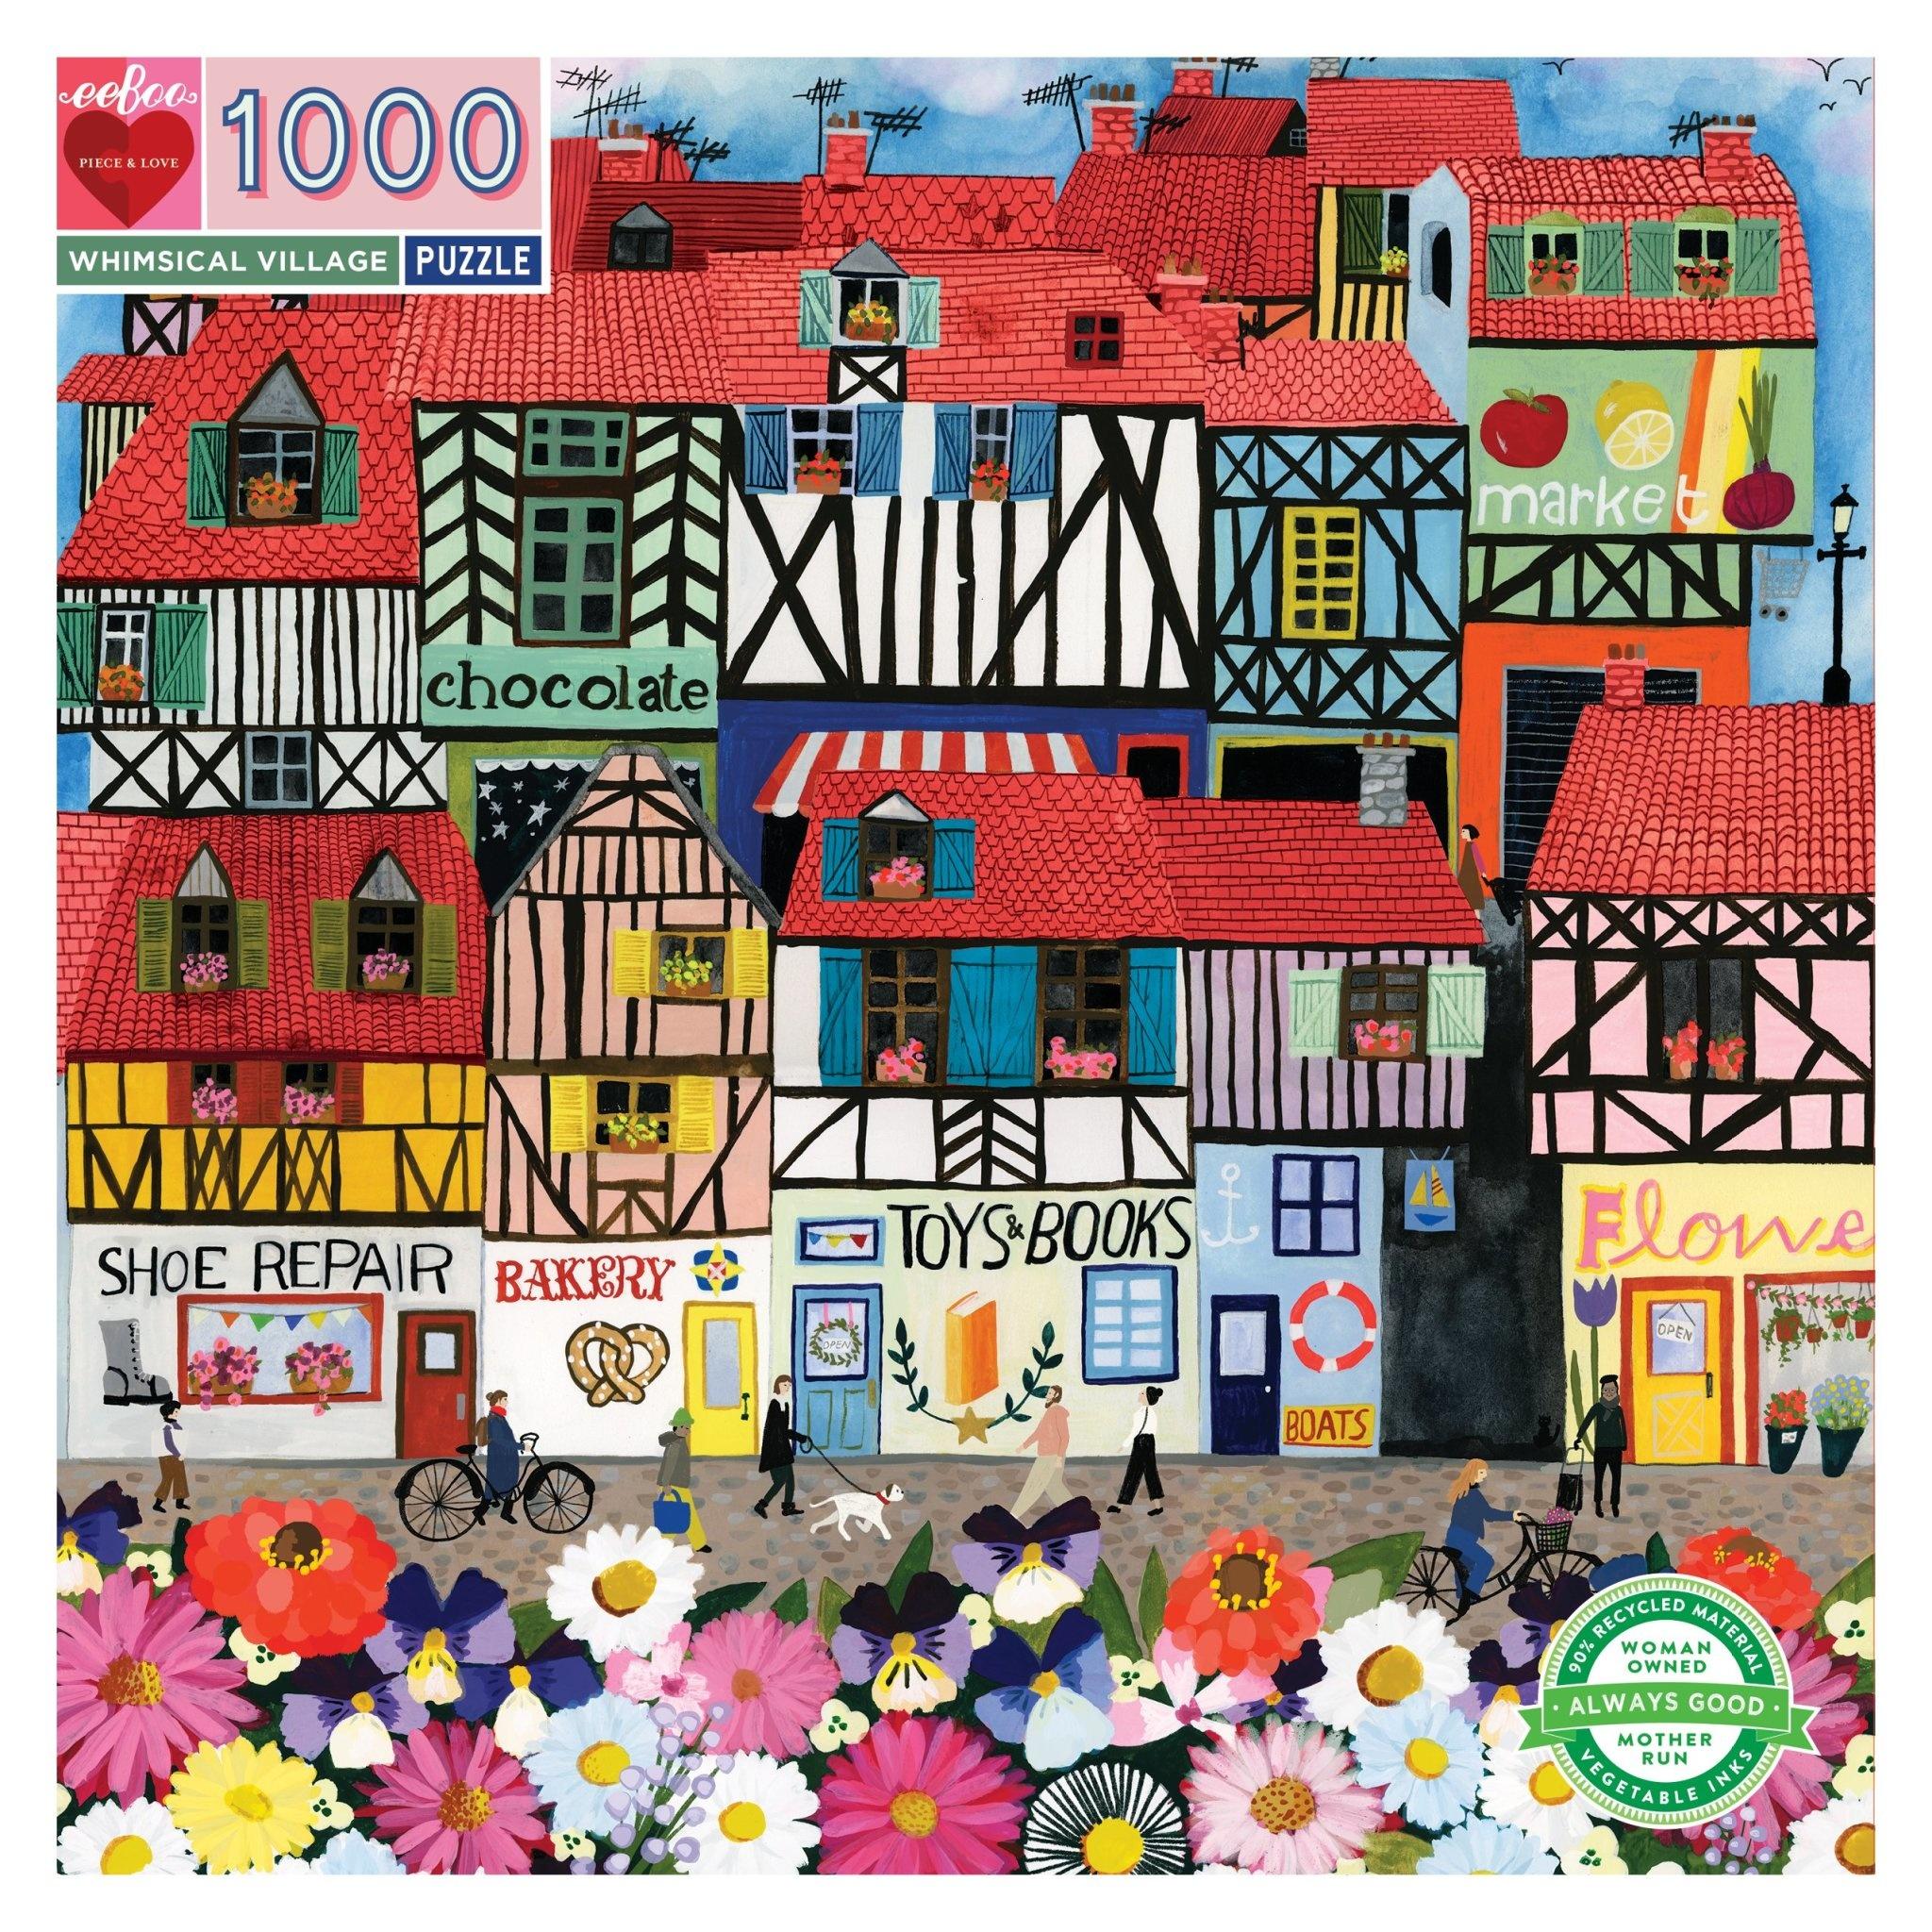 Whimsical Village (1000 Piece Puzzle)